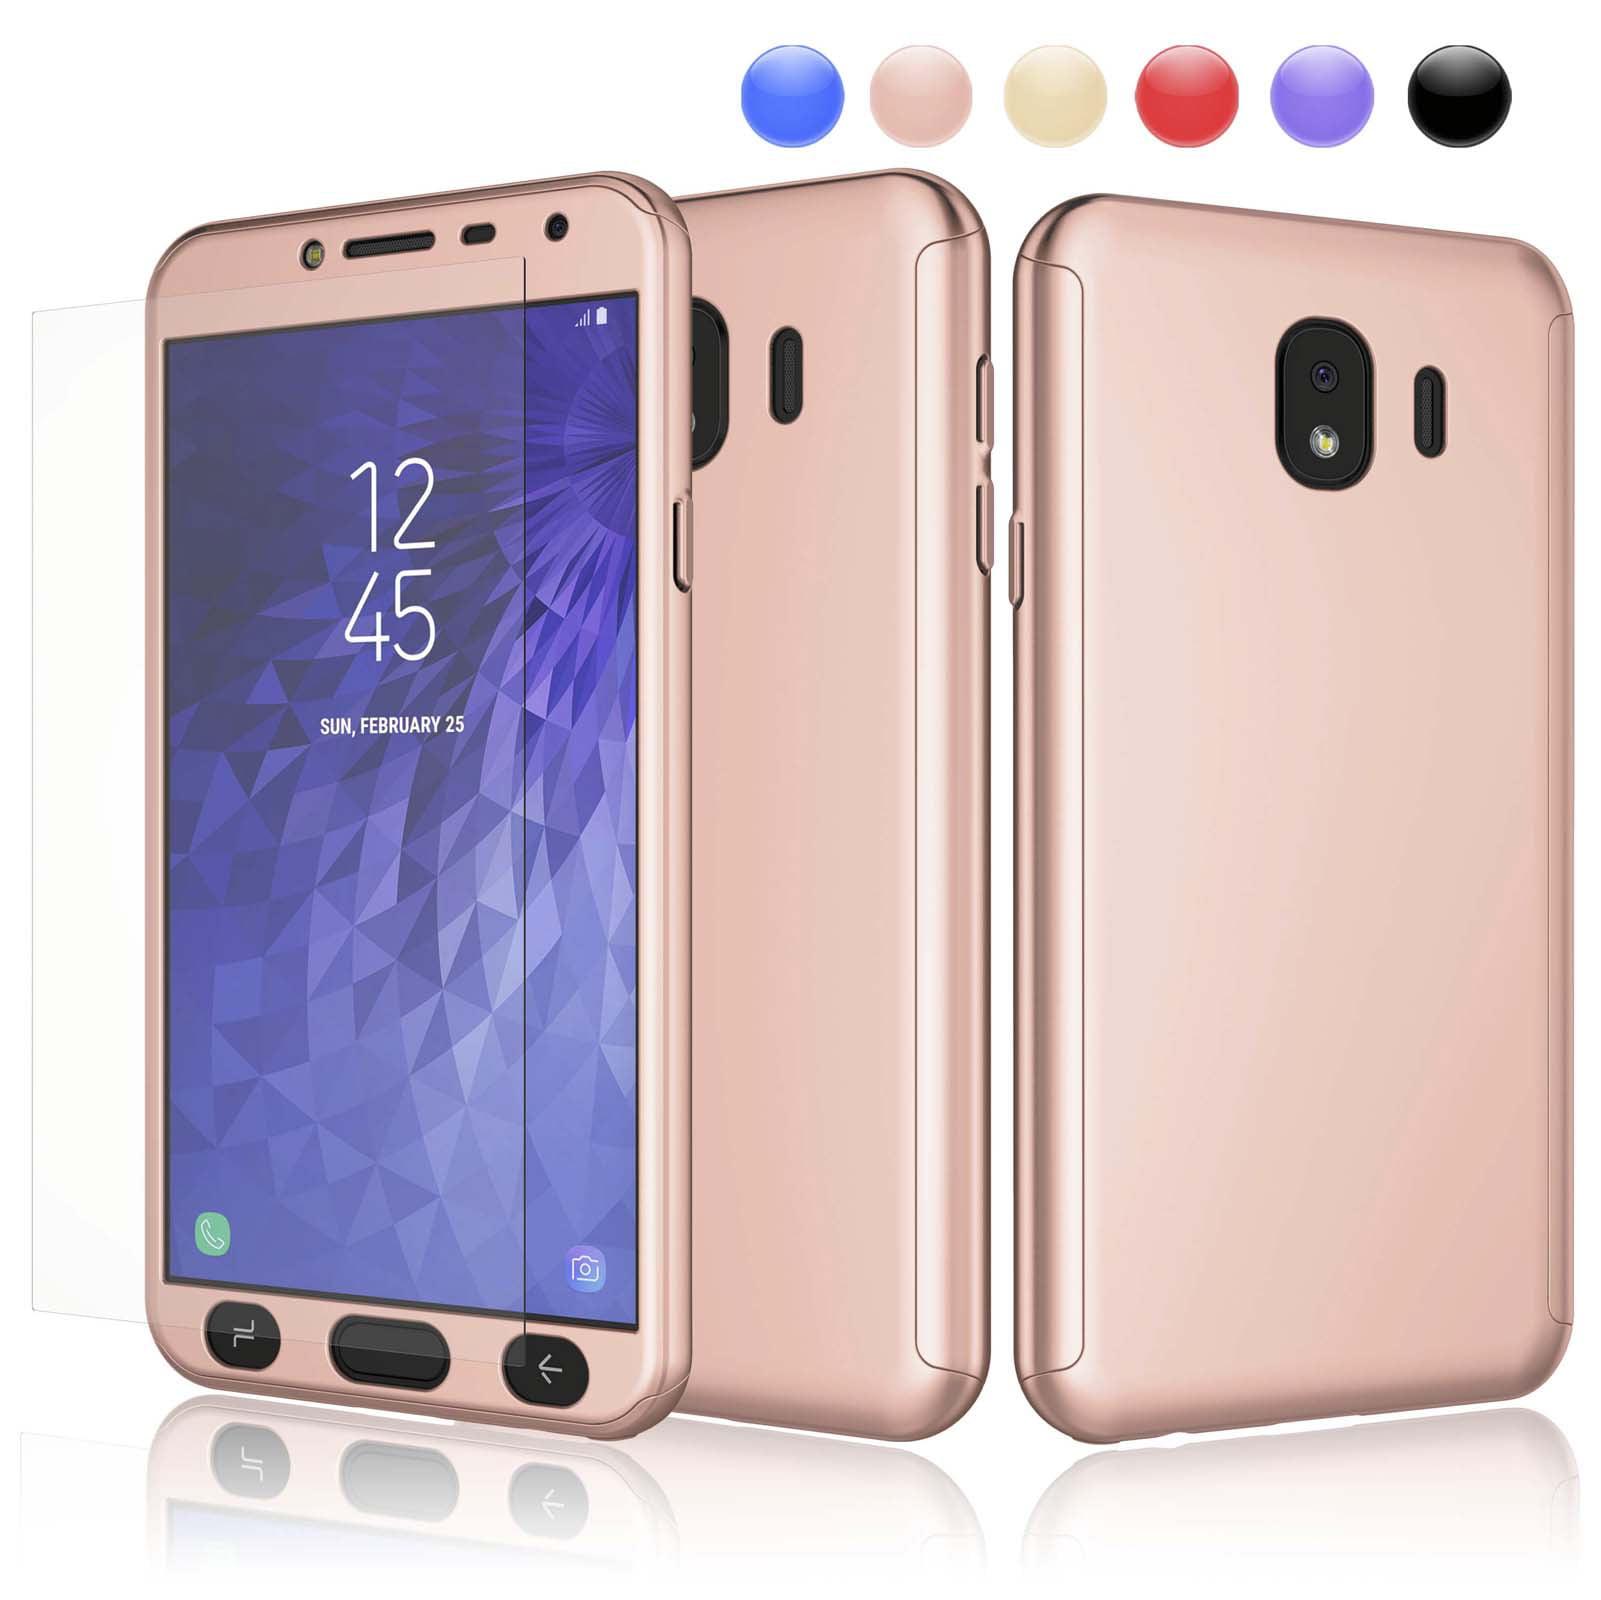 Cases for Samsung Galaxy S9 / S9+ / S10 / S10+ / S8 / S8+ / S7 / S7 Edge / Note 9 / J4 2018 / J6 2018, Njjex Ultra Thin Premium Dual Layer Plastic Hard Case with Screen Protector Skin